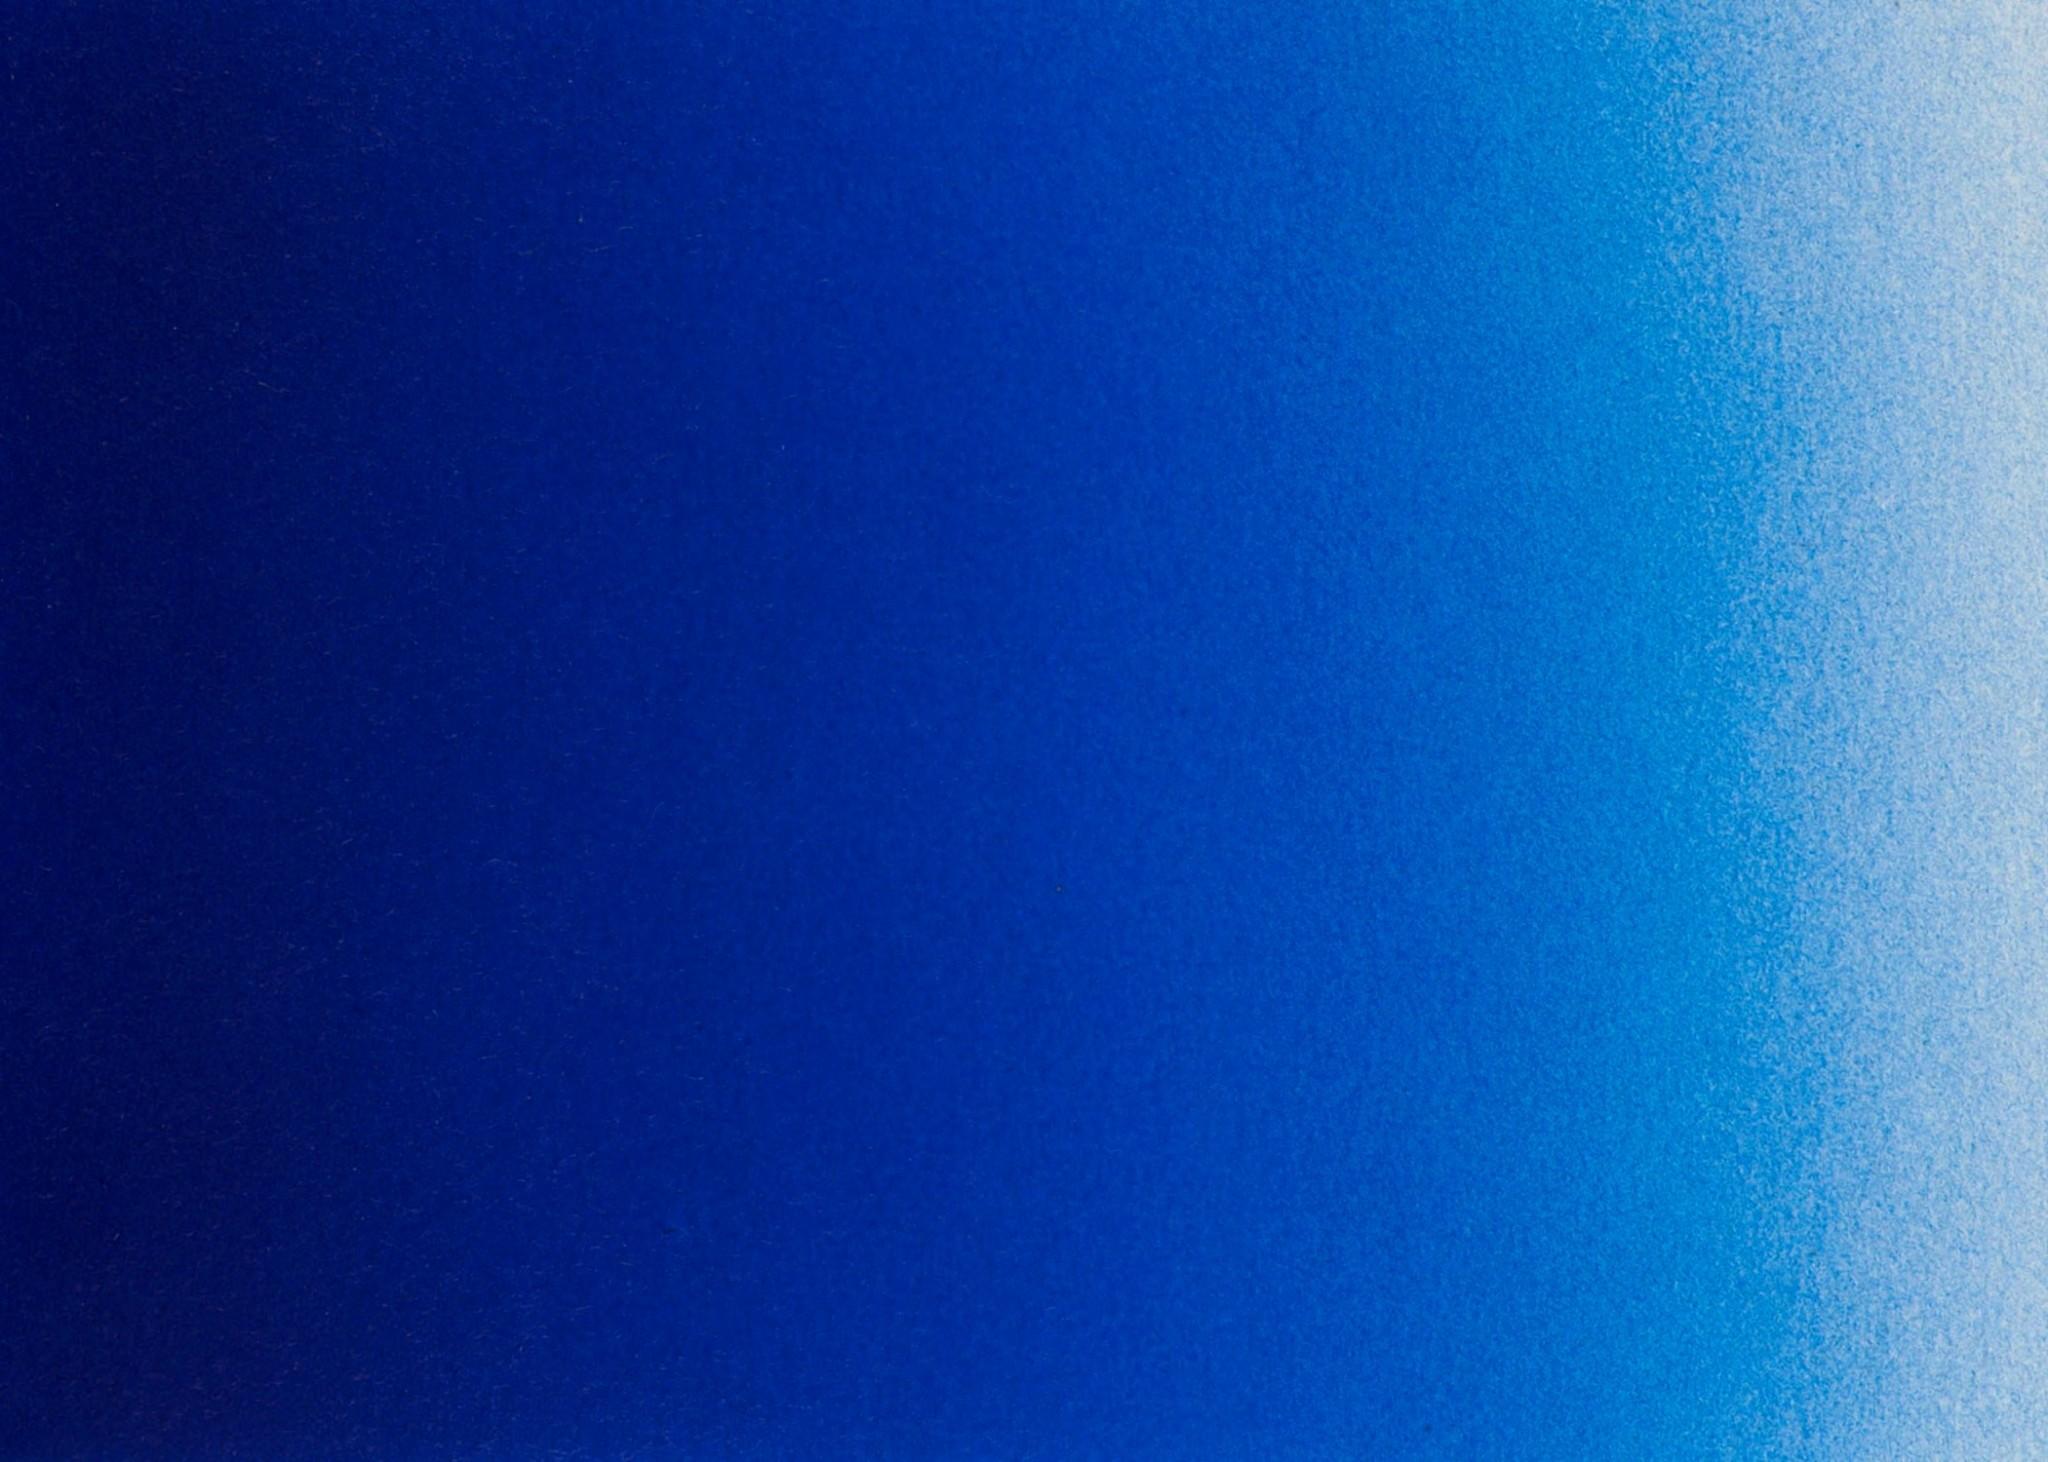 blue late backgrounds desktop